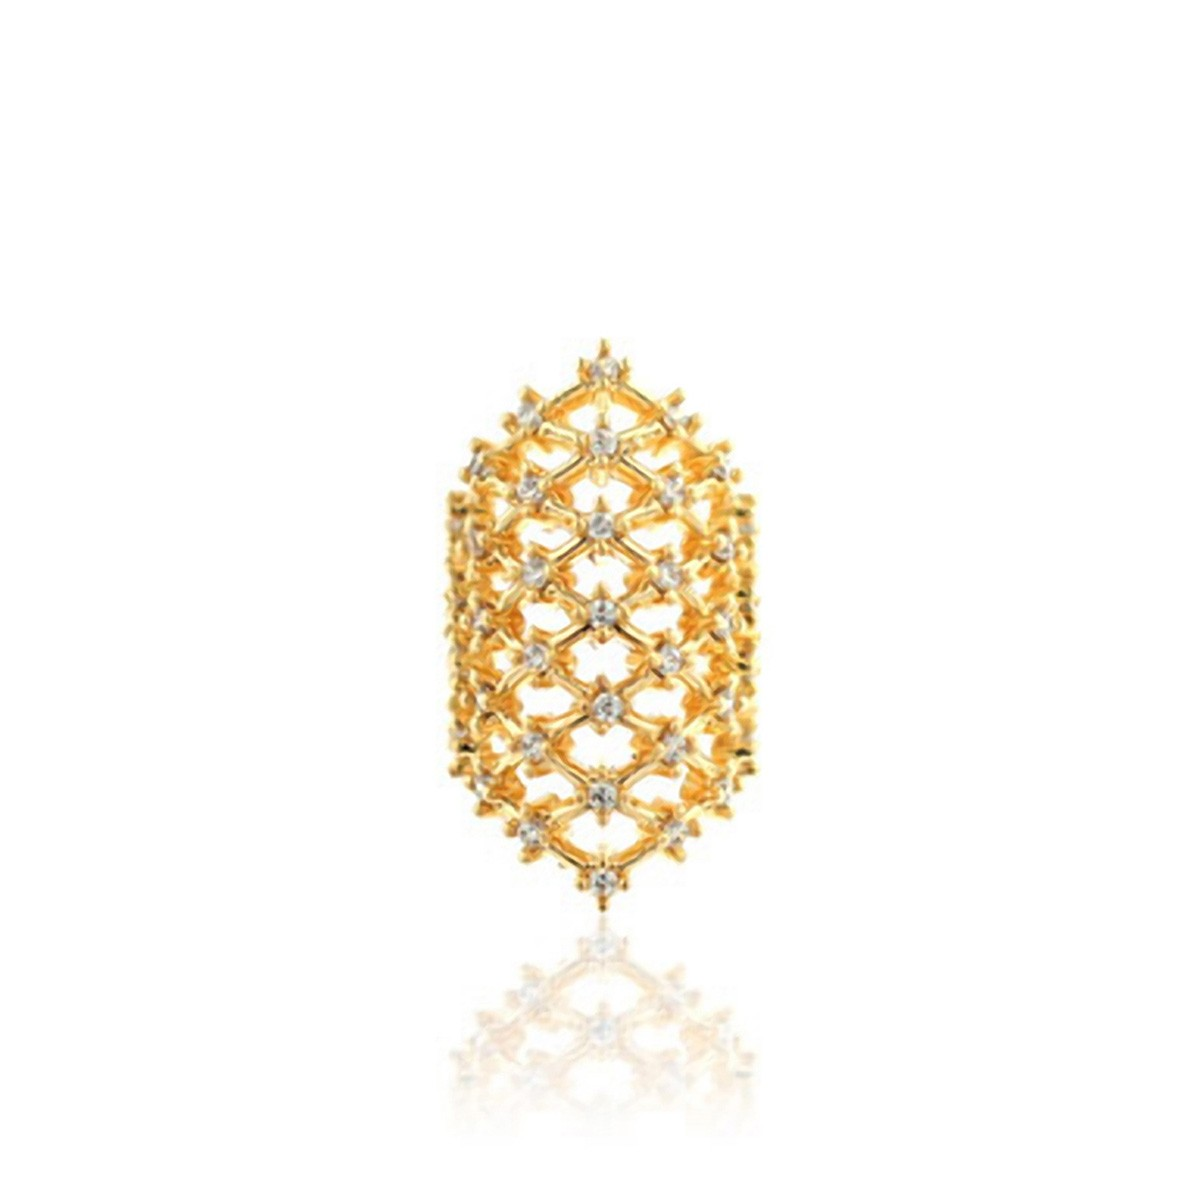 Piercing Falso Rendado Luxo Cravejado de Zircônia Semijoia em Ouro 18K  - SOLOYOU